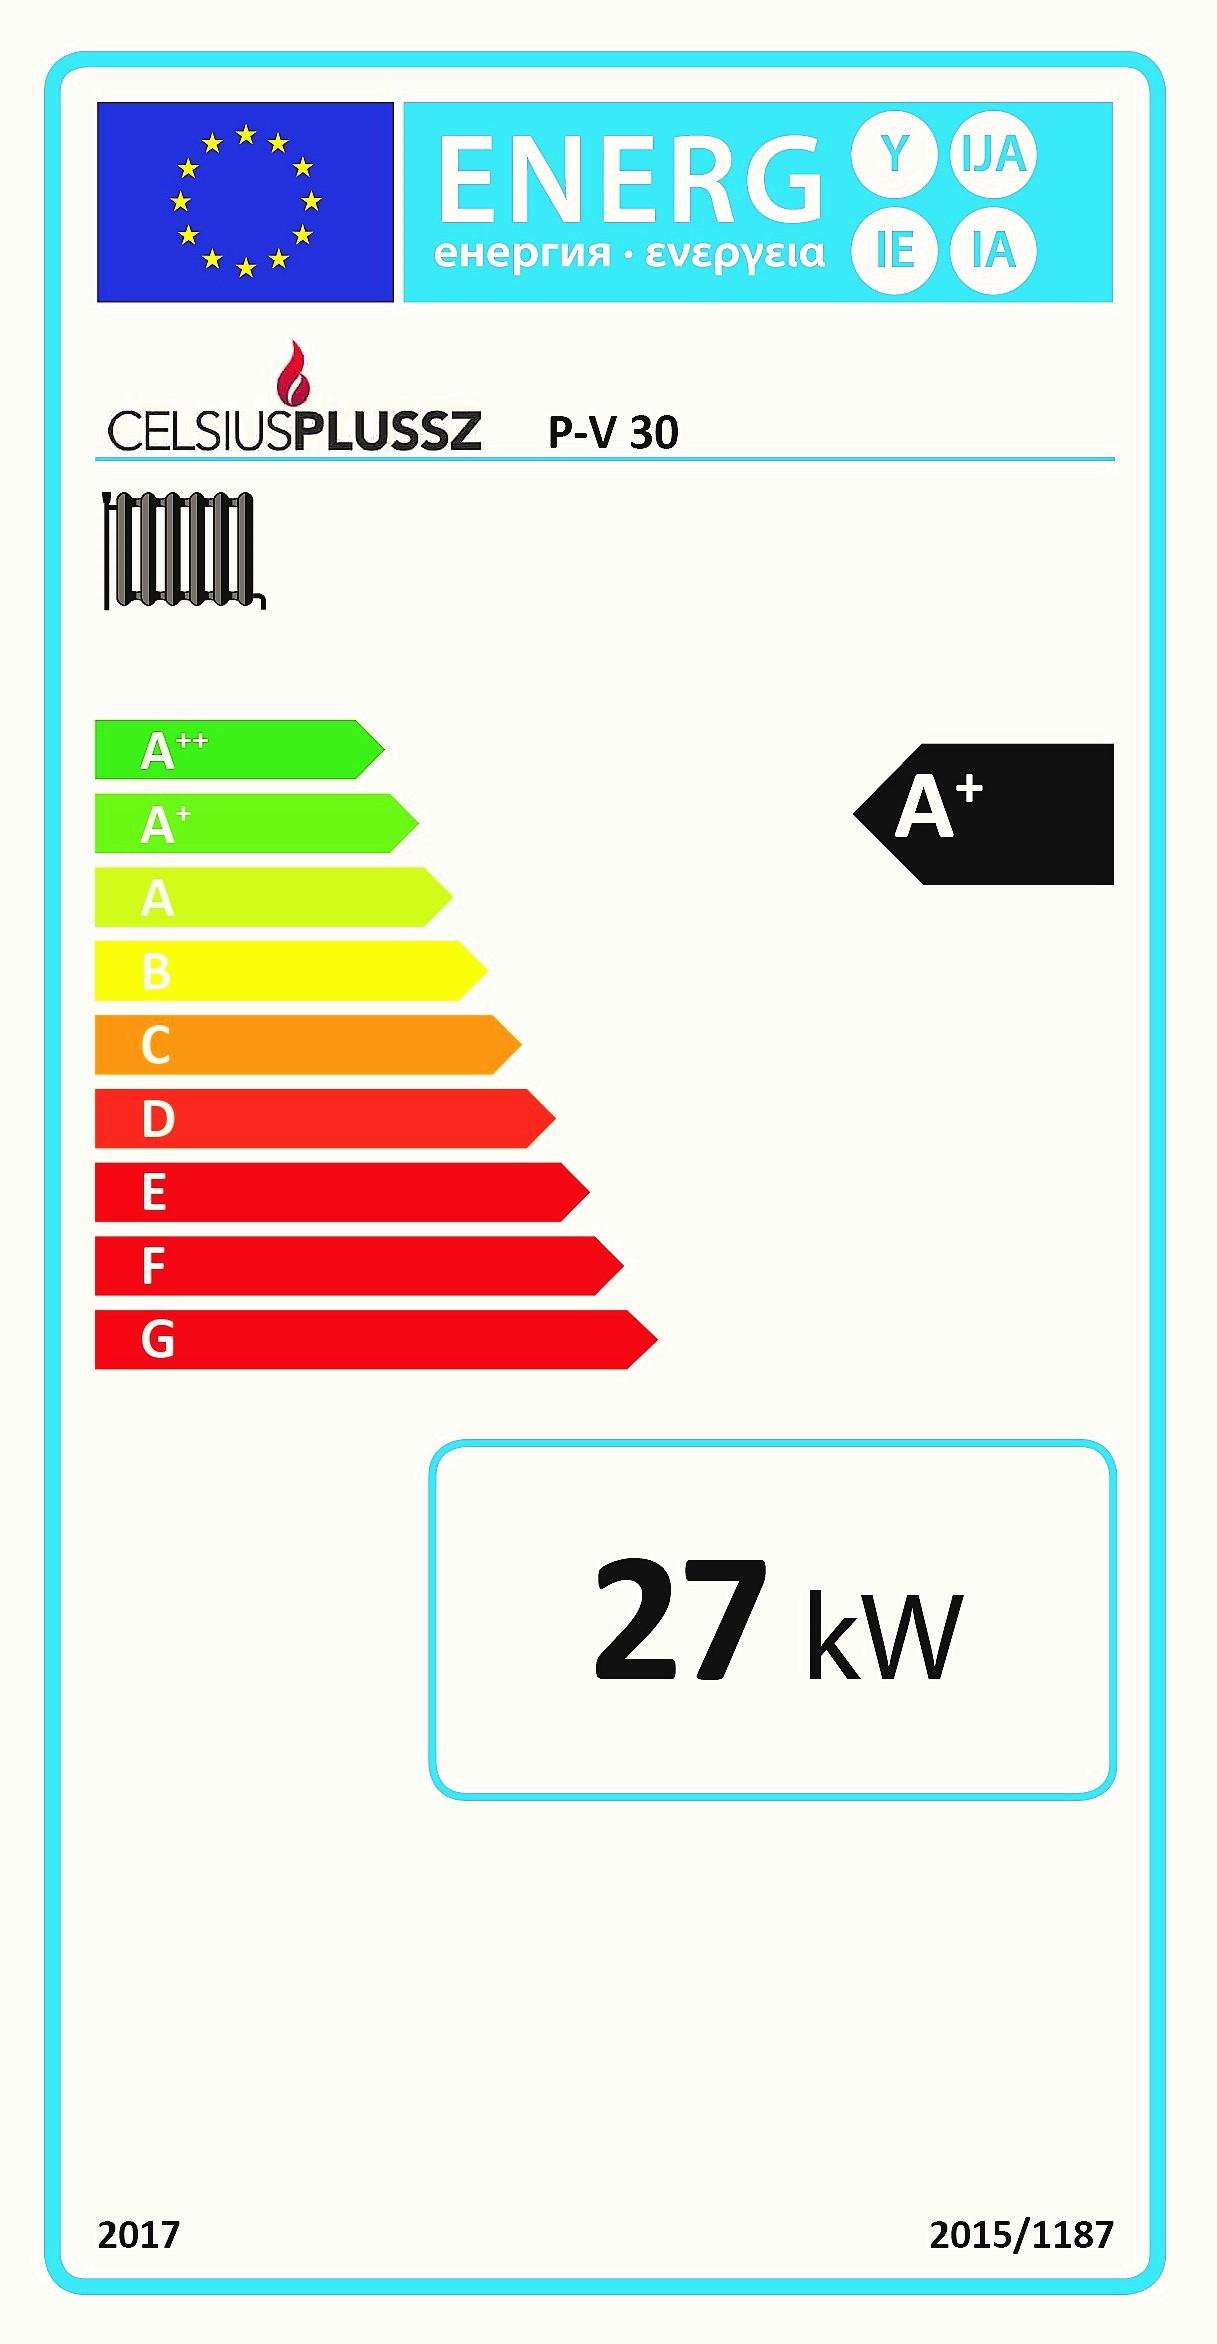 Celsius P-V 30 energiacímke